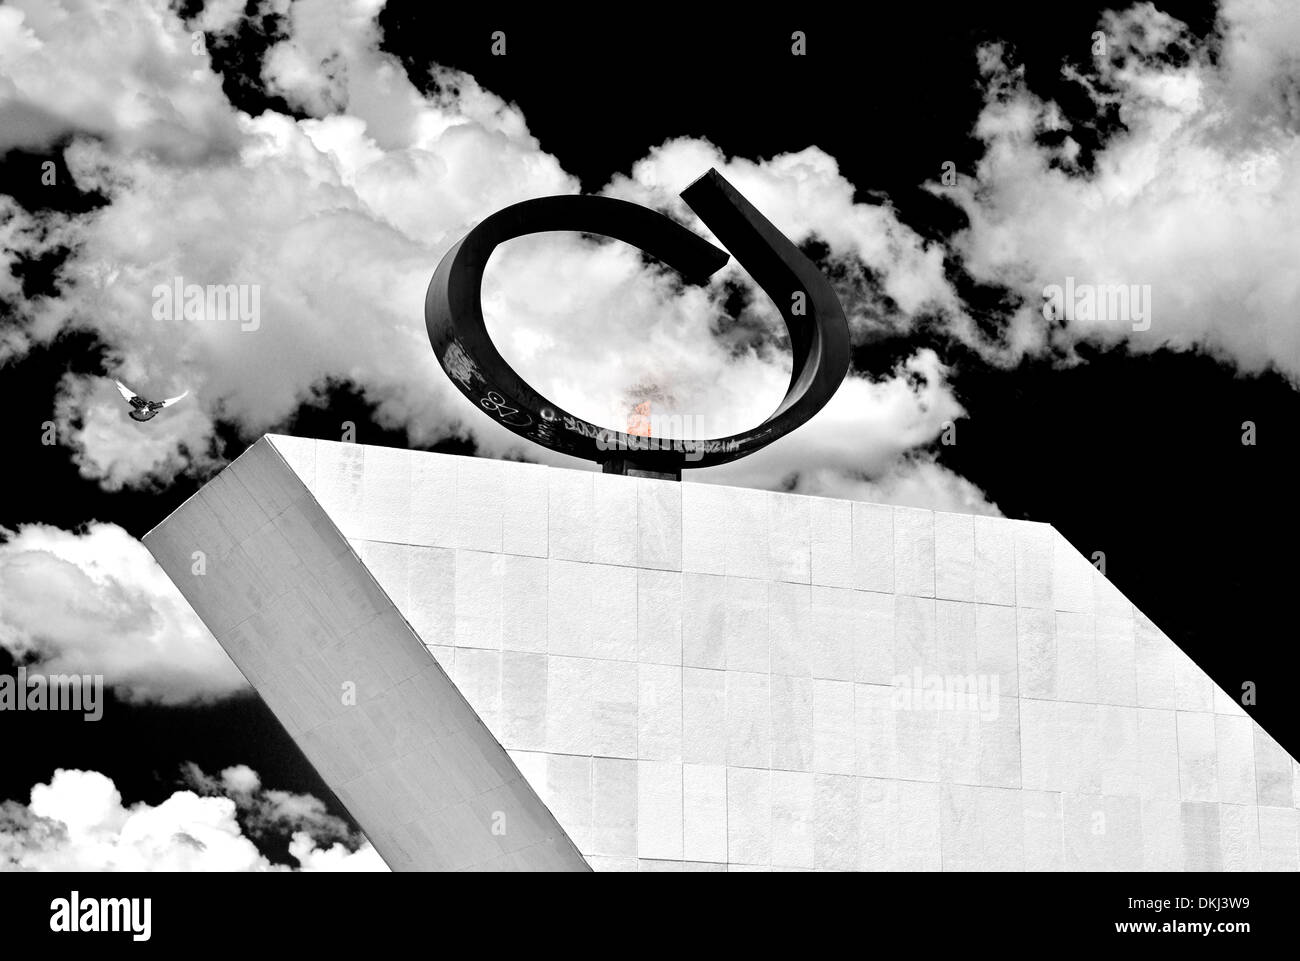 Brazil, Brasilia: Eternal flame of the Pantheon and Memorial Tancredo Neves - Stock Image